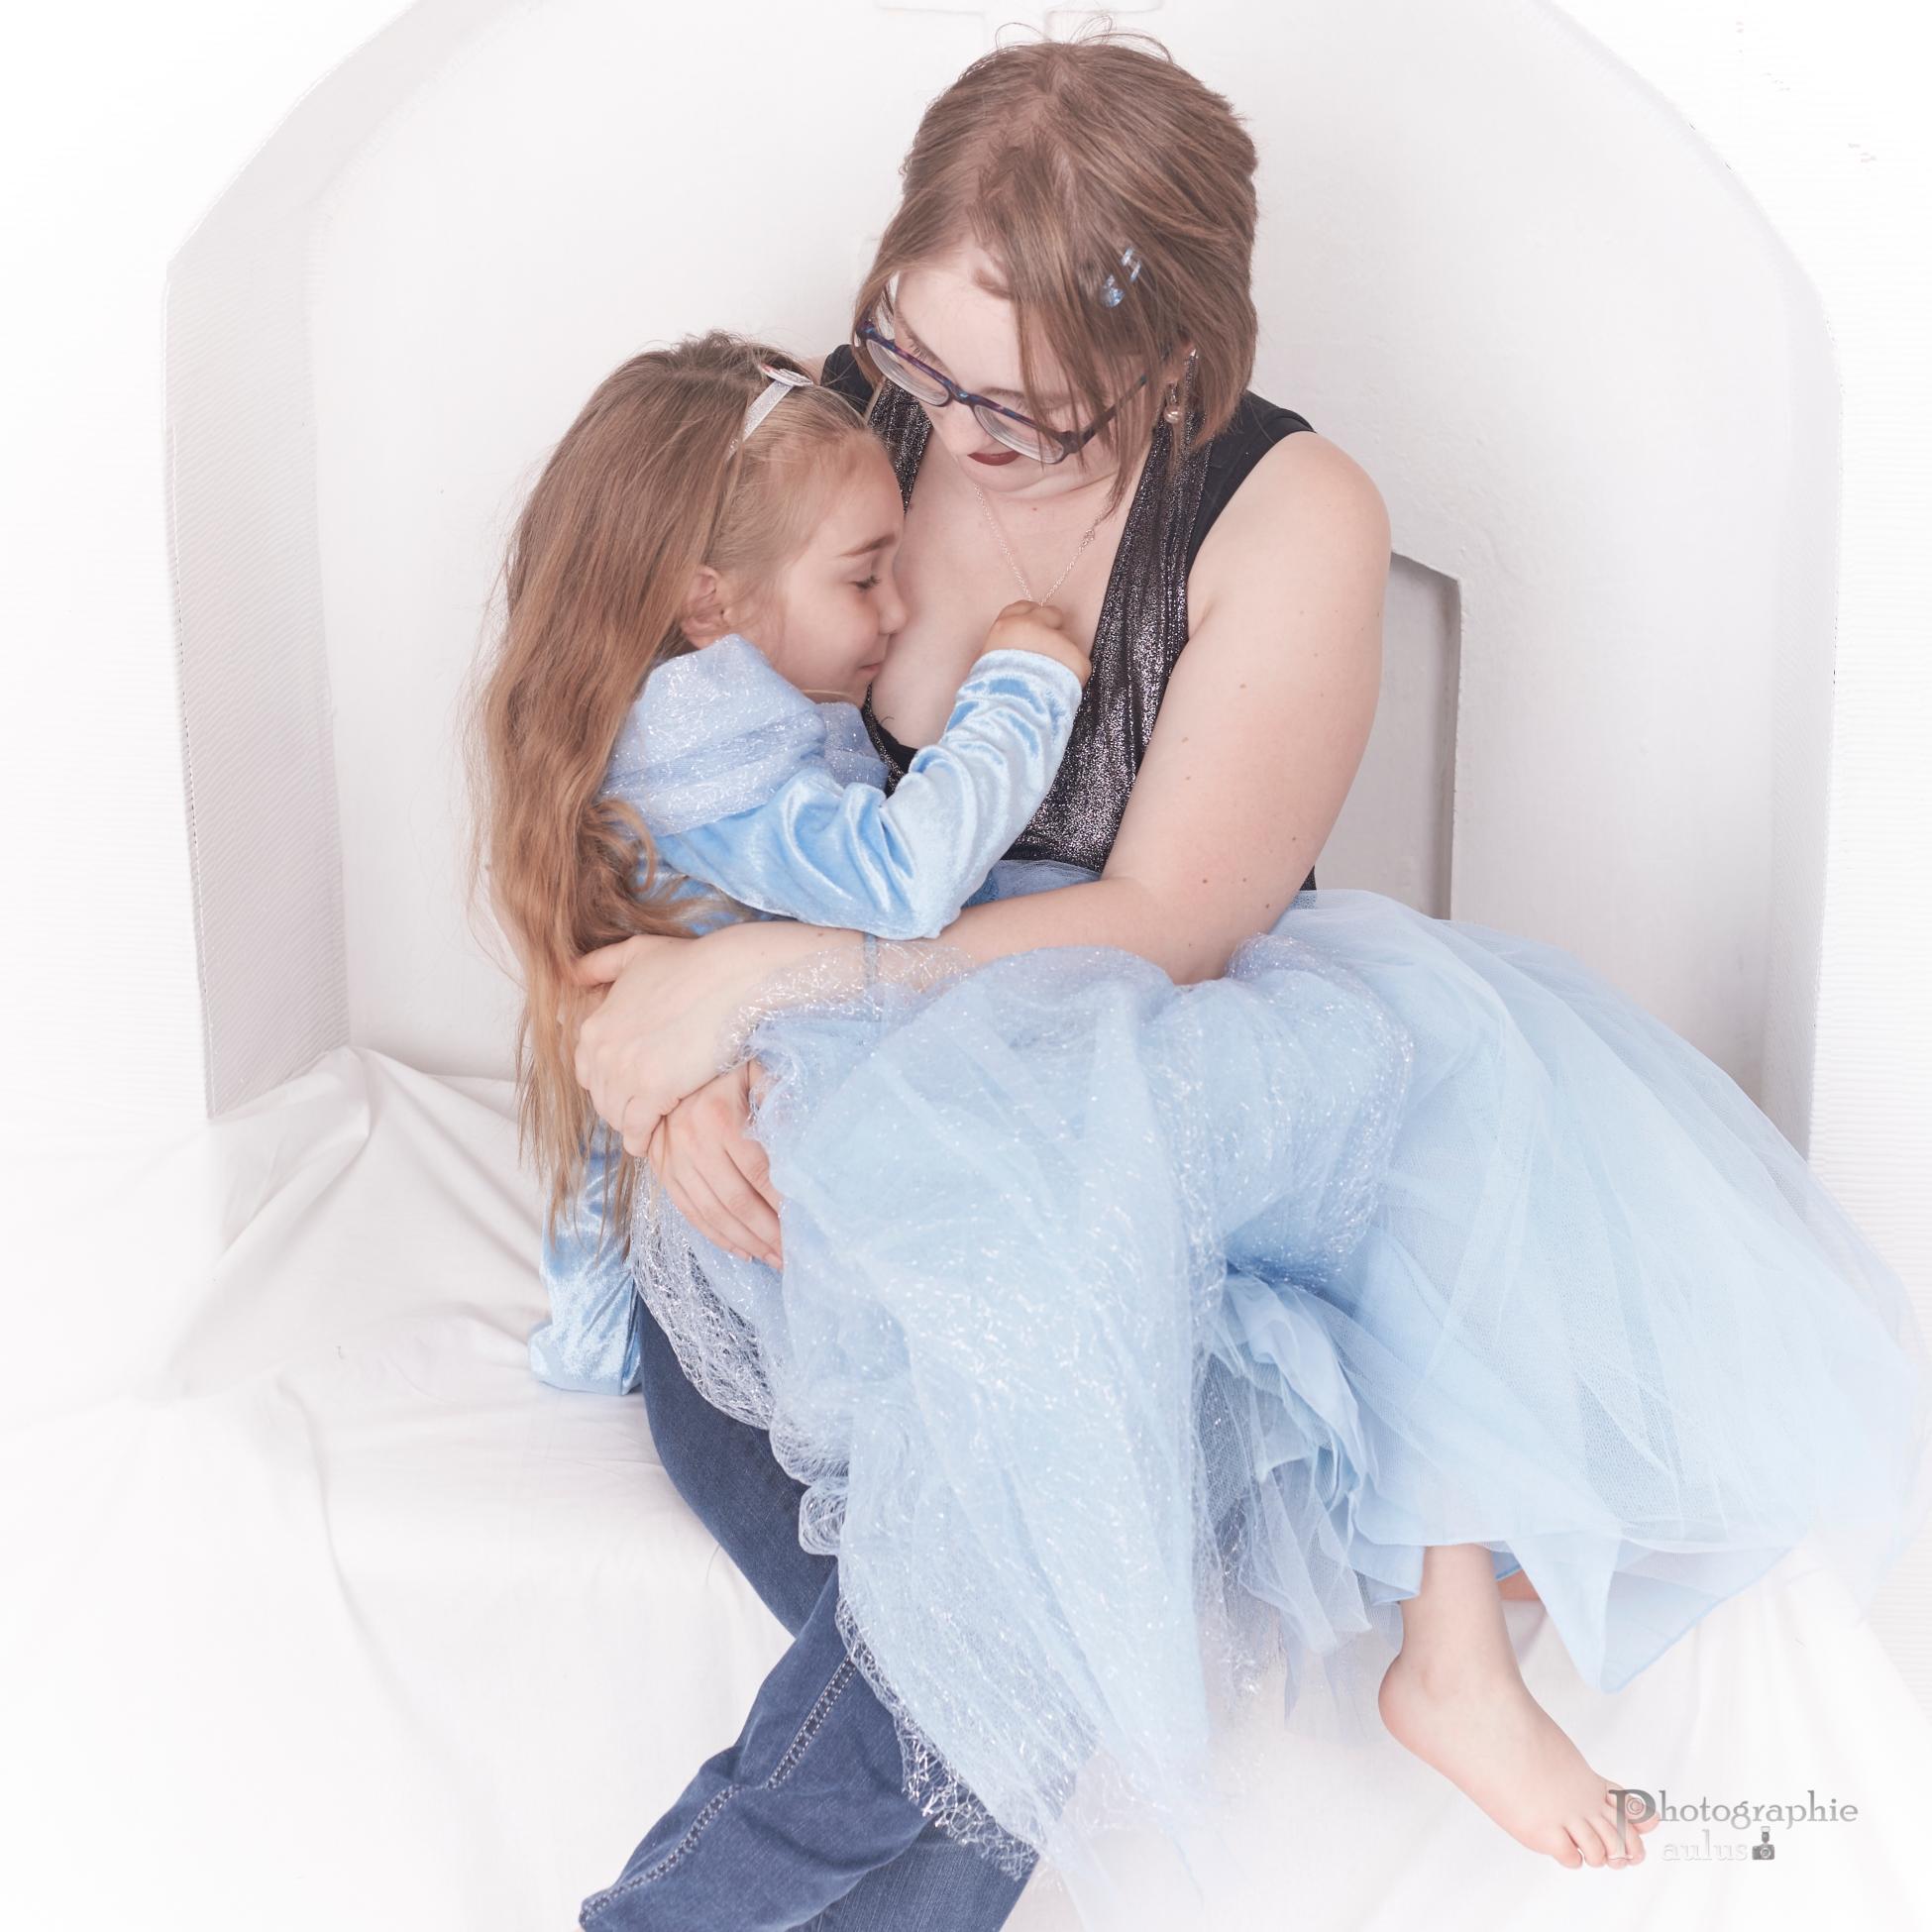 Famille Hodiaumont0571